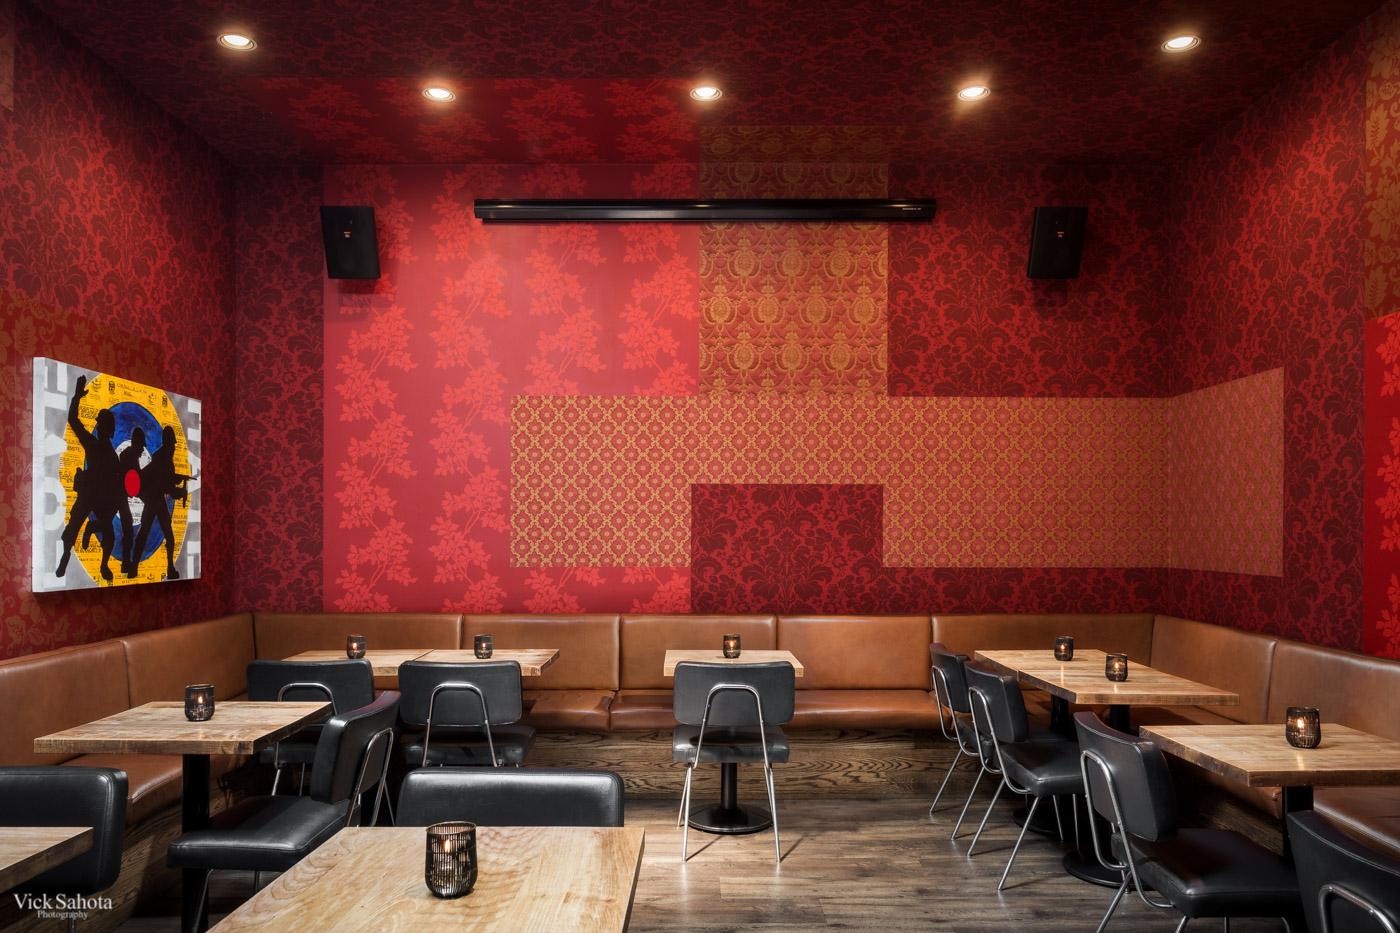 The Cascade Room Lounge